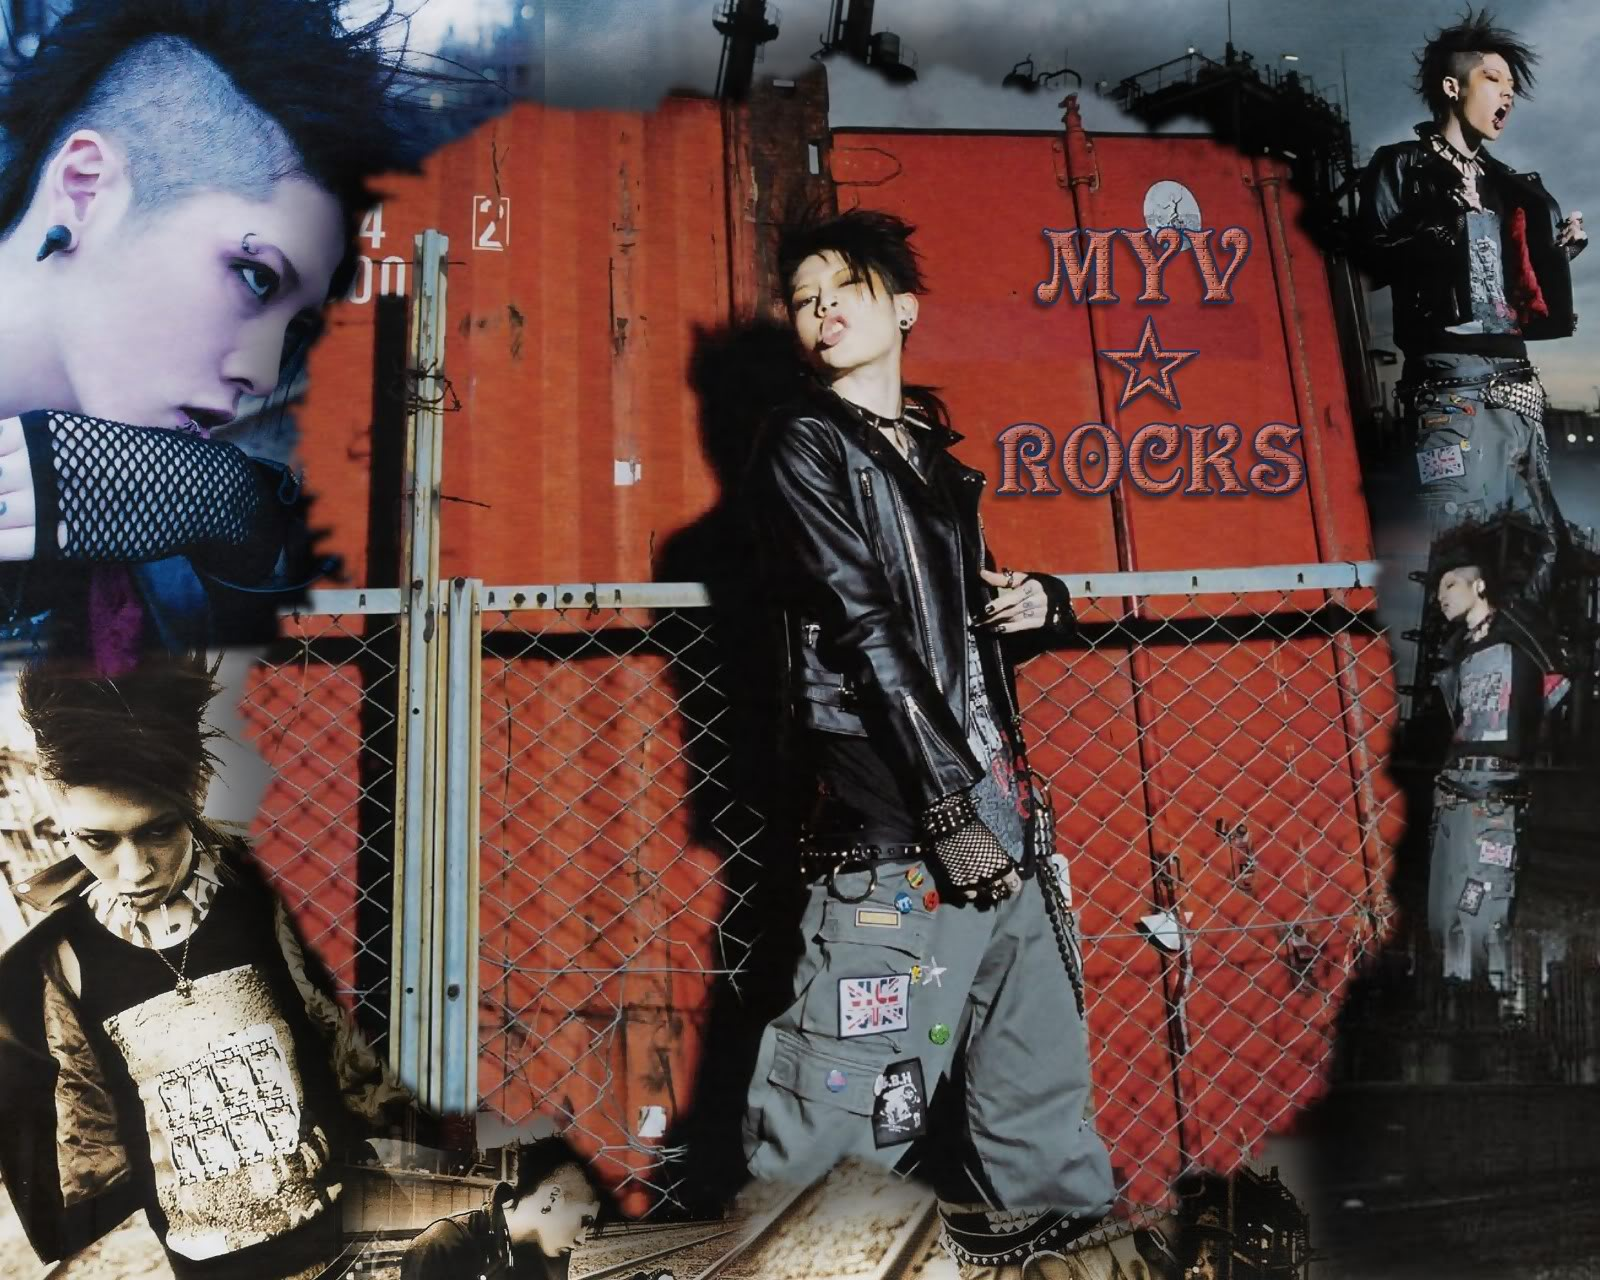 MYVROCKS2007Photoimpact.JPG